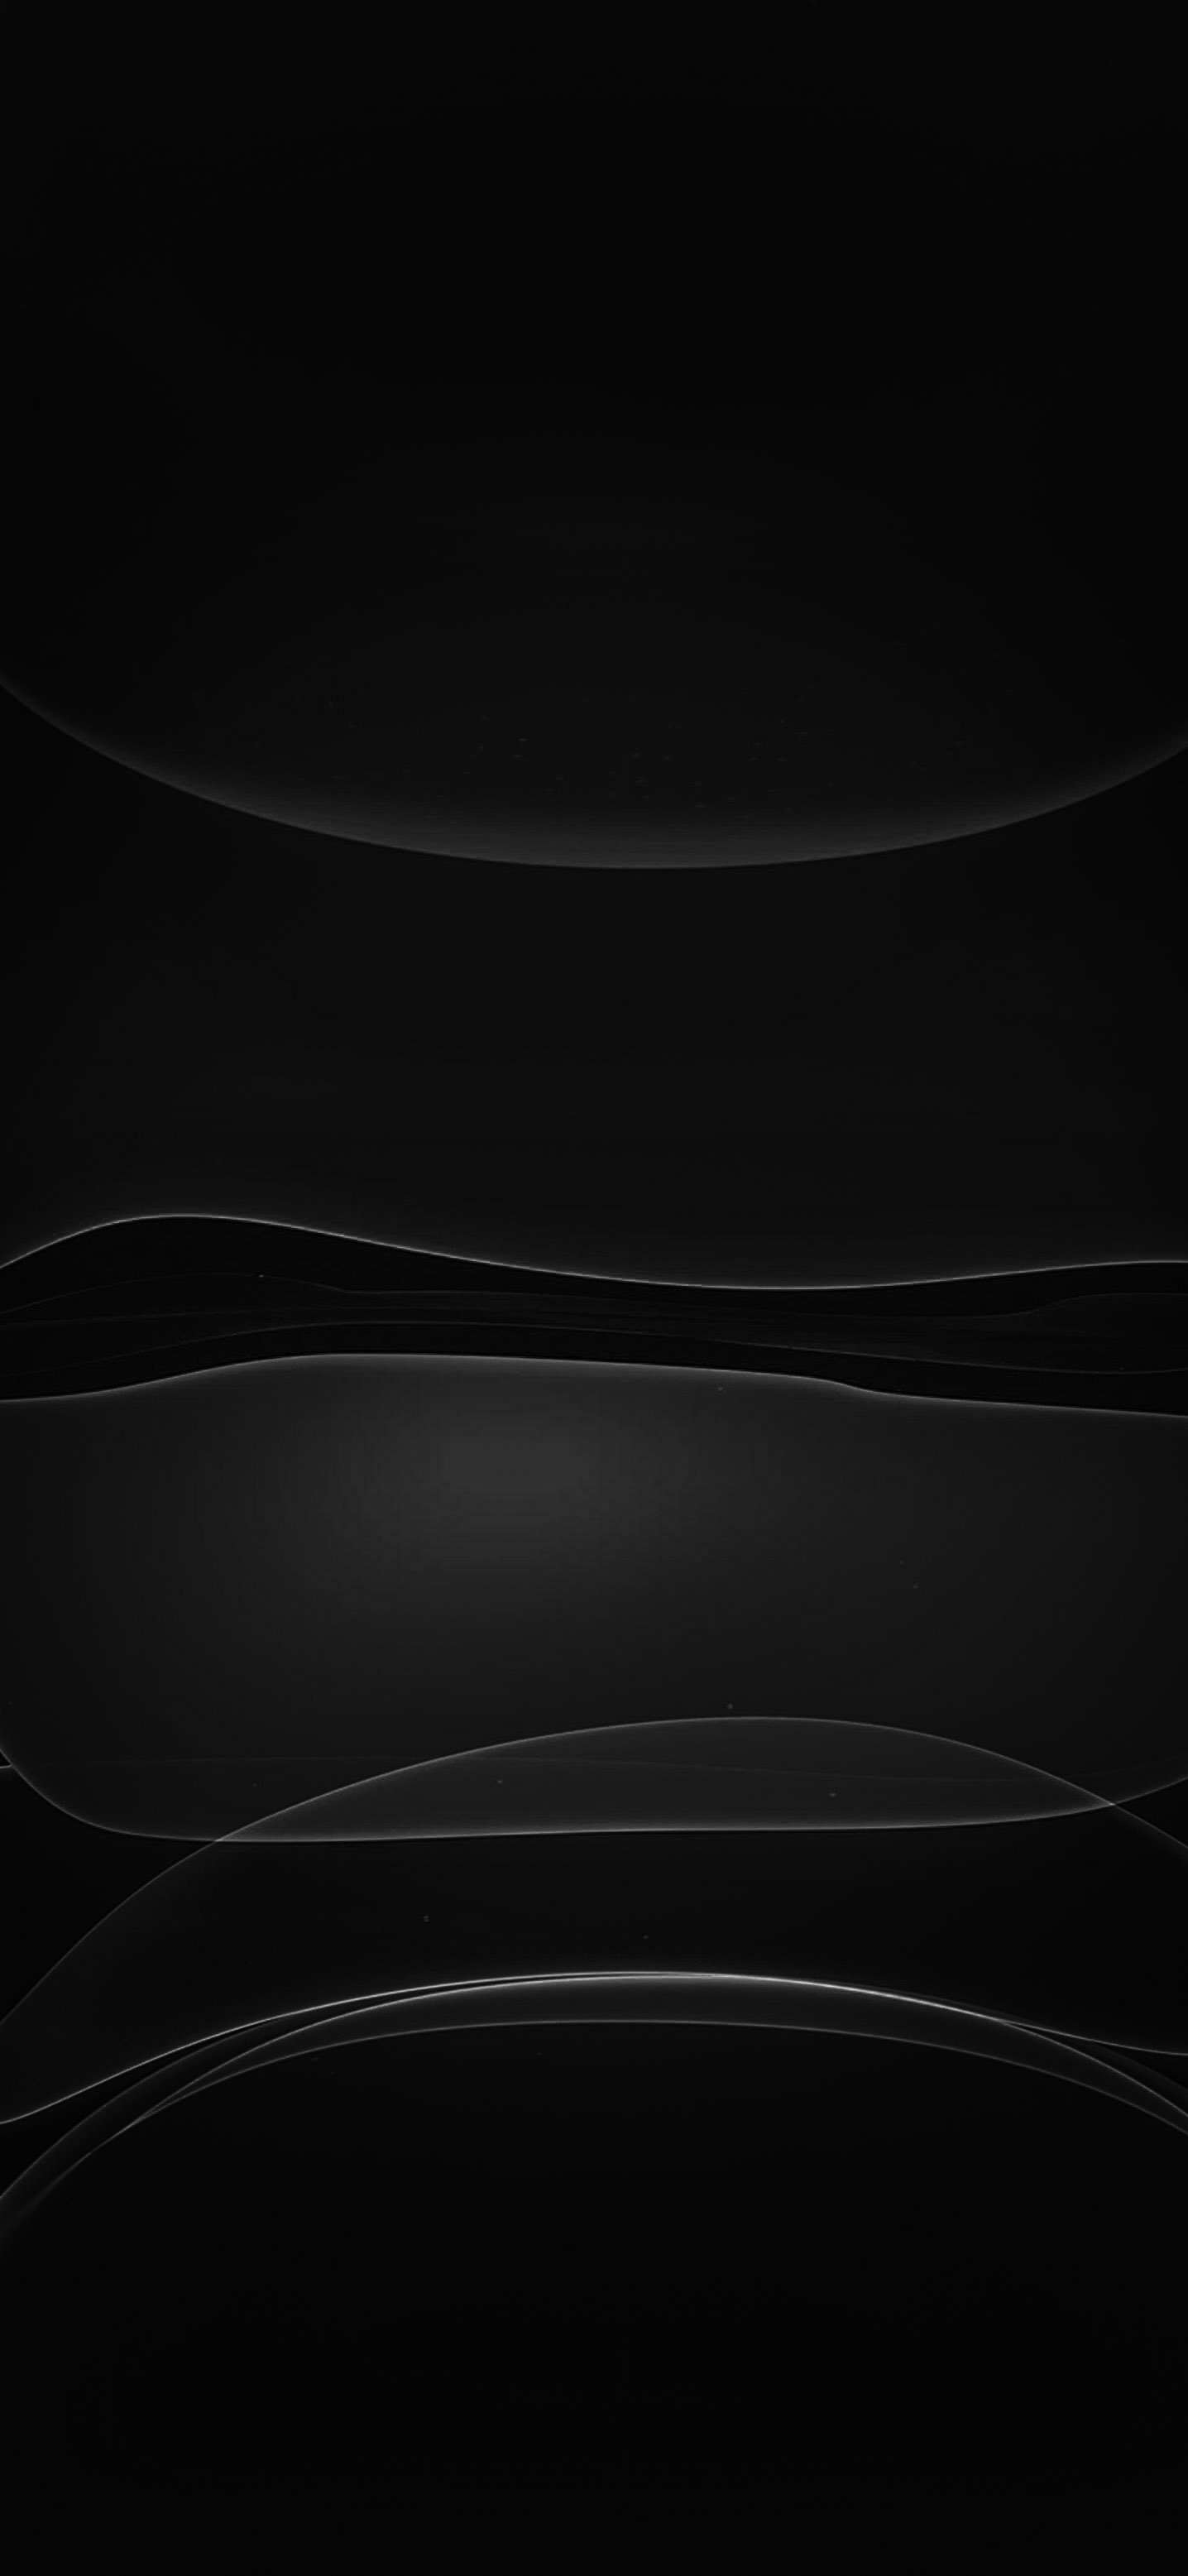 Stock Apple 12 Black Wallpaper HD 1436x3113